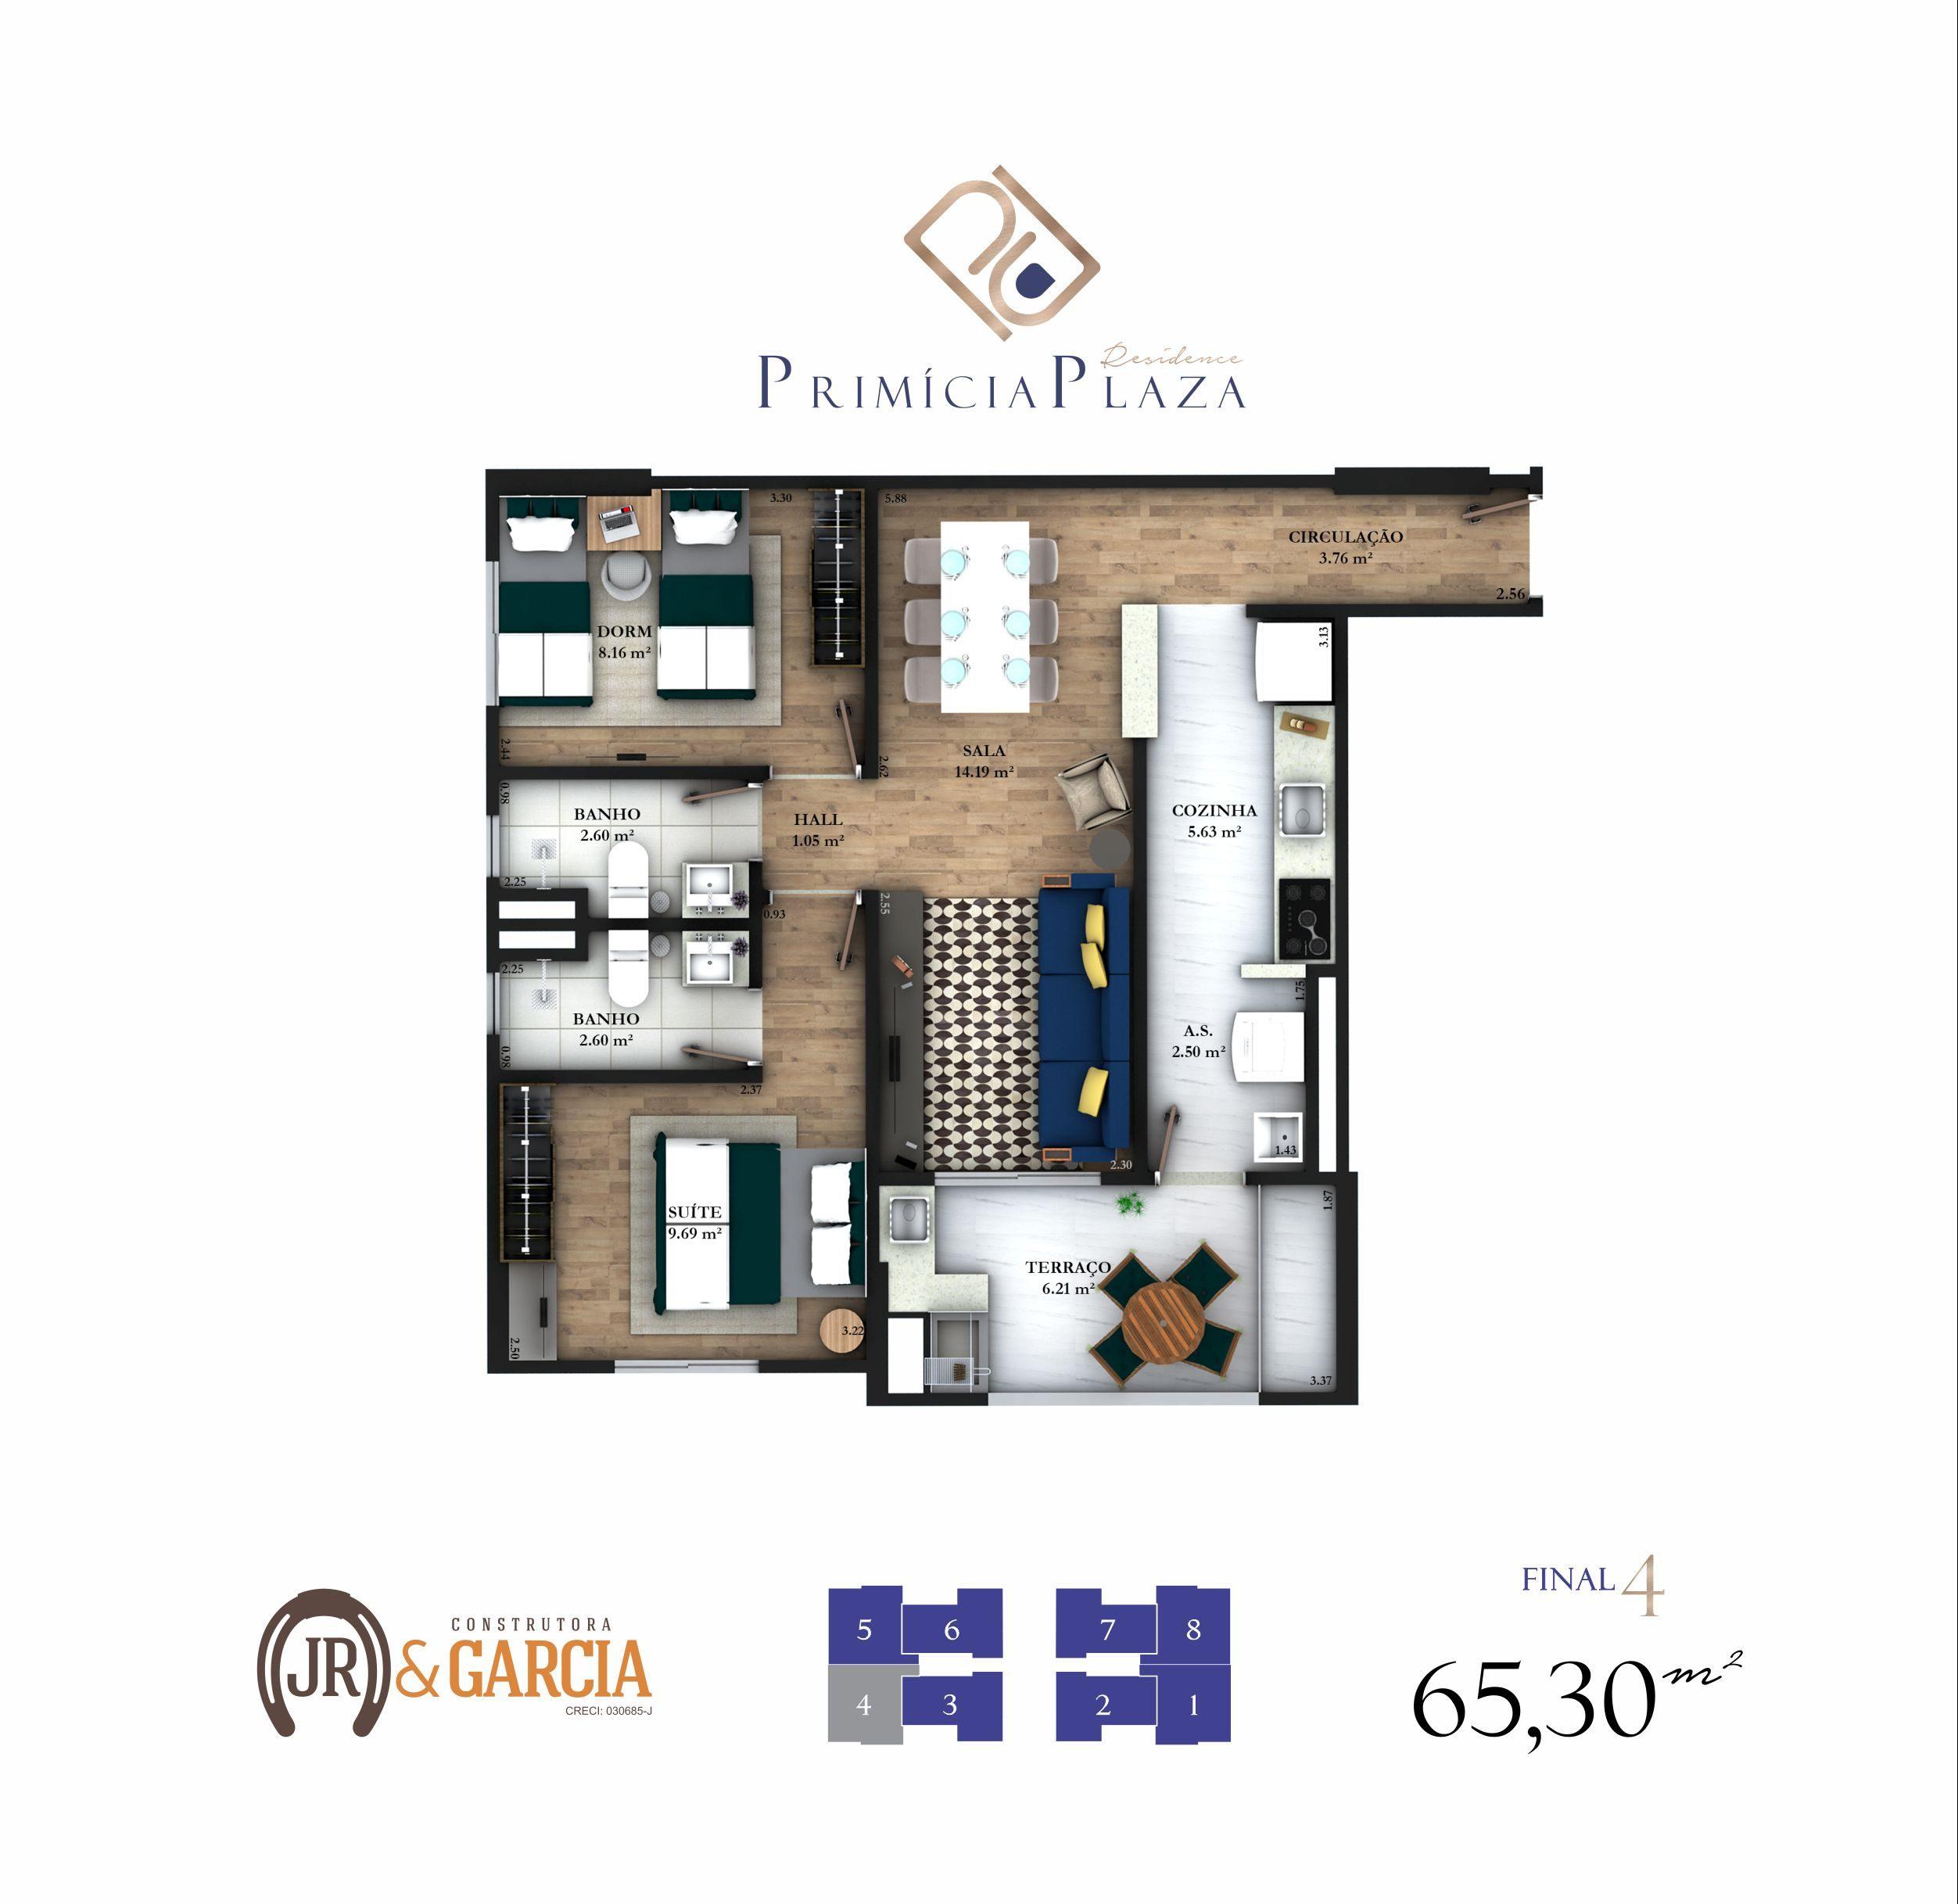 Apartamento 14-194 - 65,00 m² - Residencial Primícia Plaza - Praia Grande SP